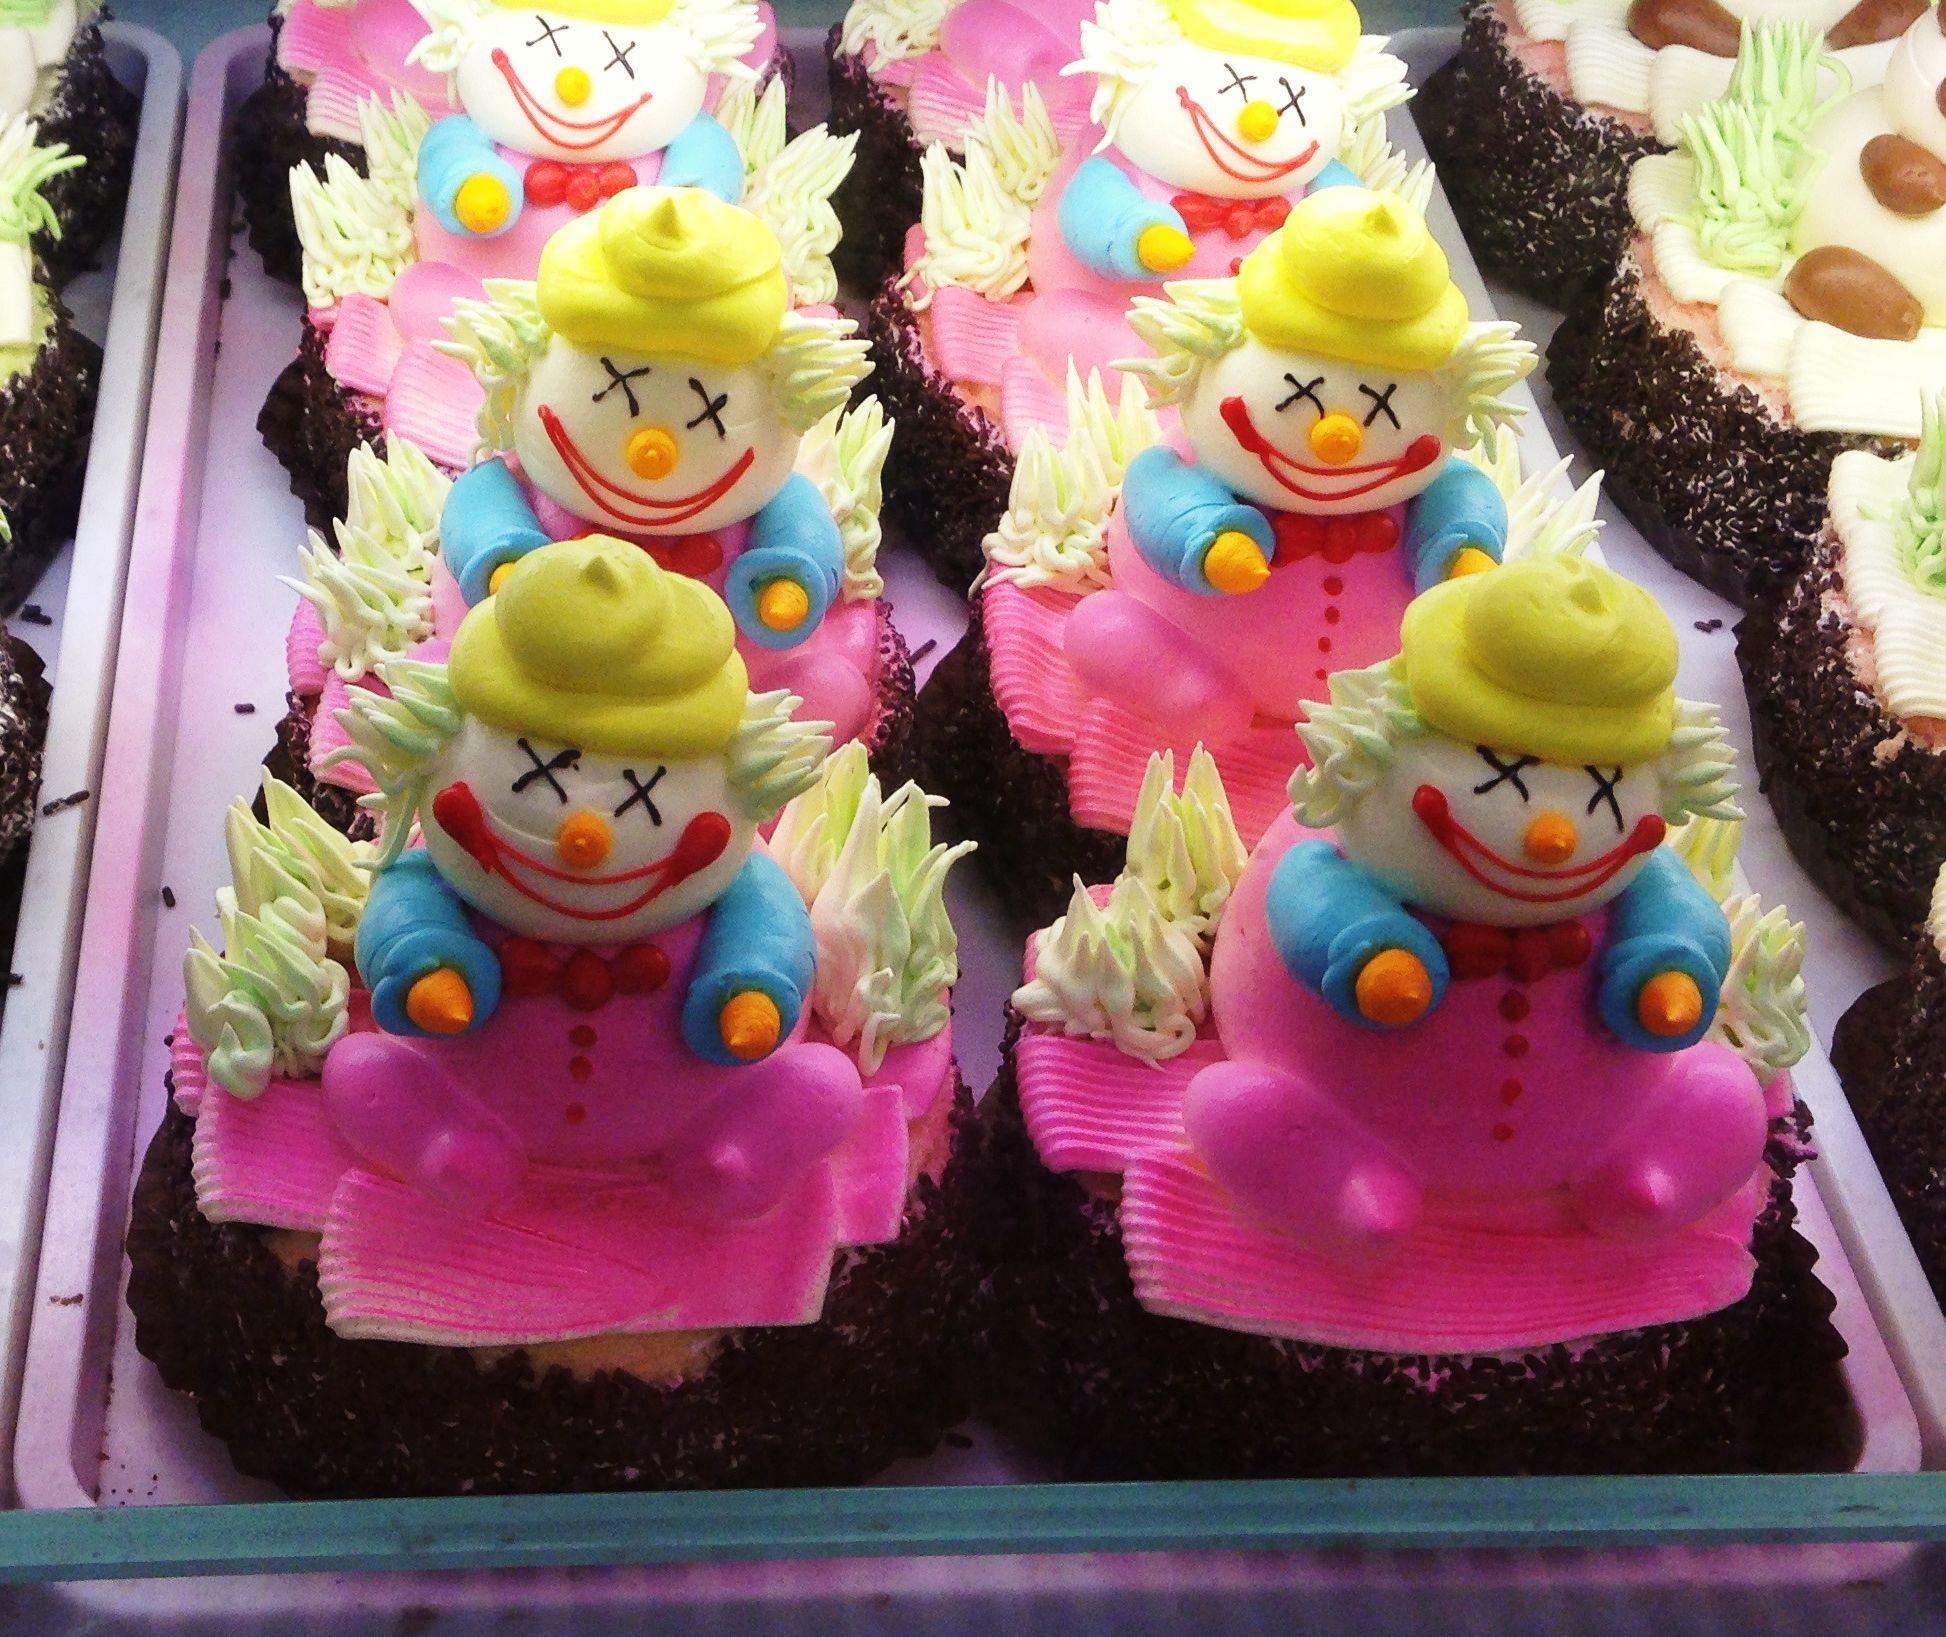 Spooky Clown Cakes in Chinatown, Soho, London Uk | Soap | Pinterest